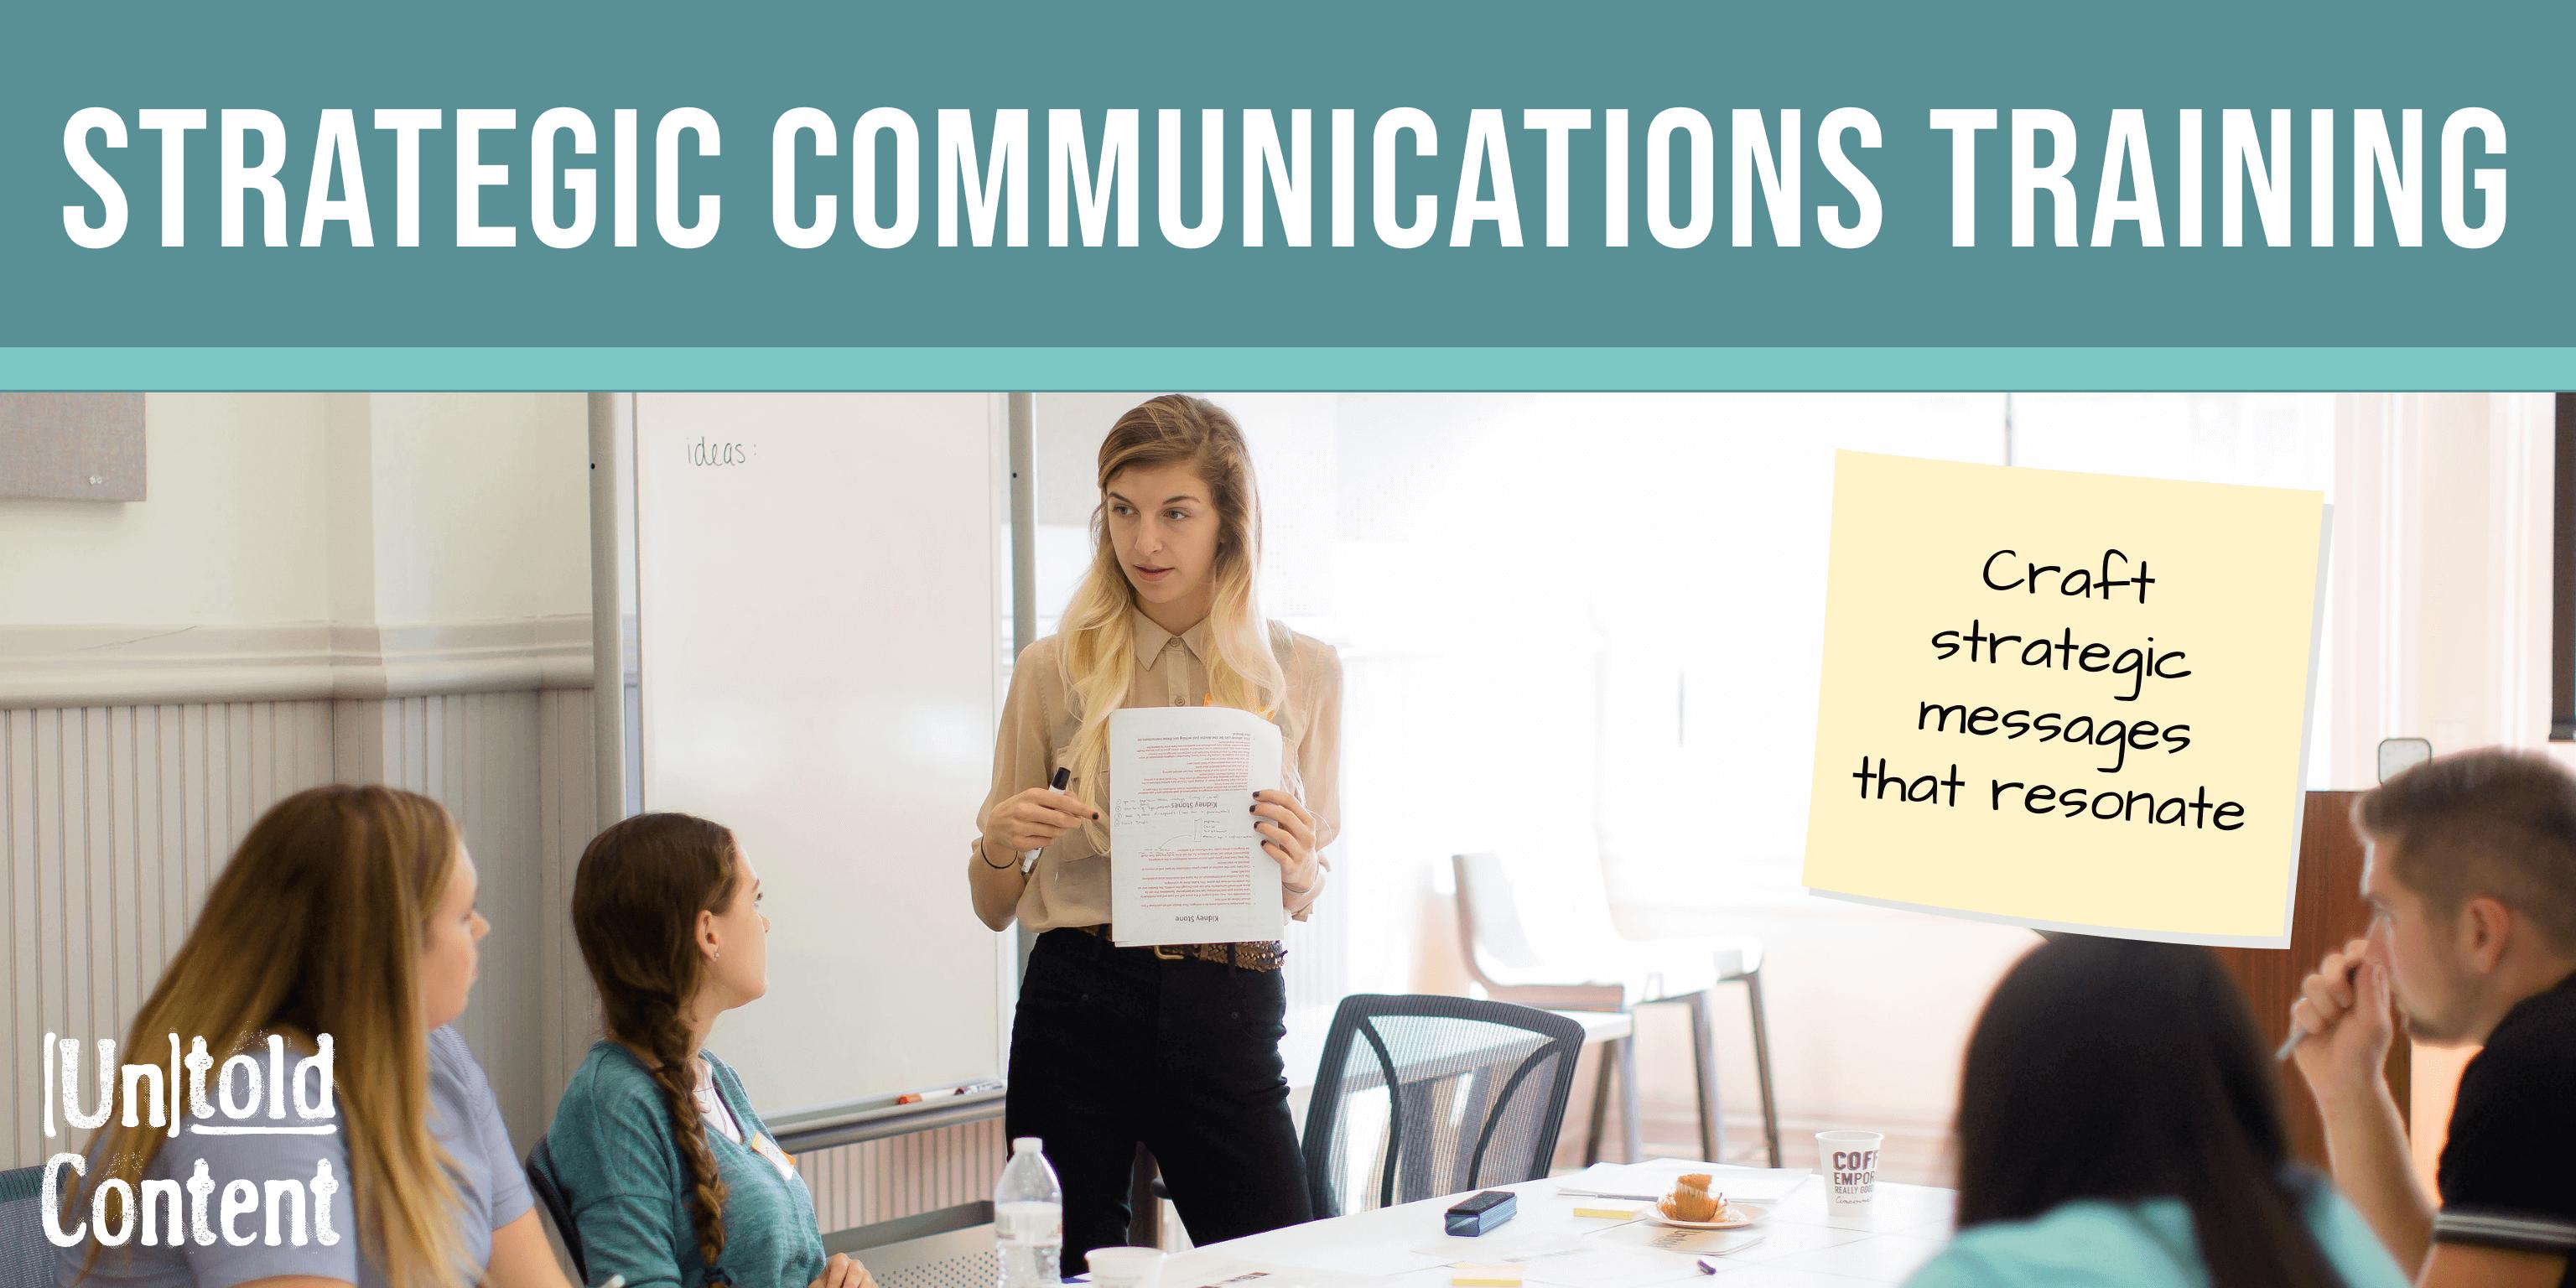 Strategic Communications Training